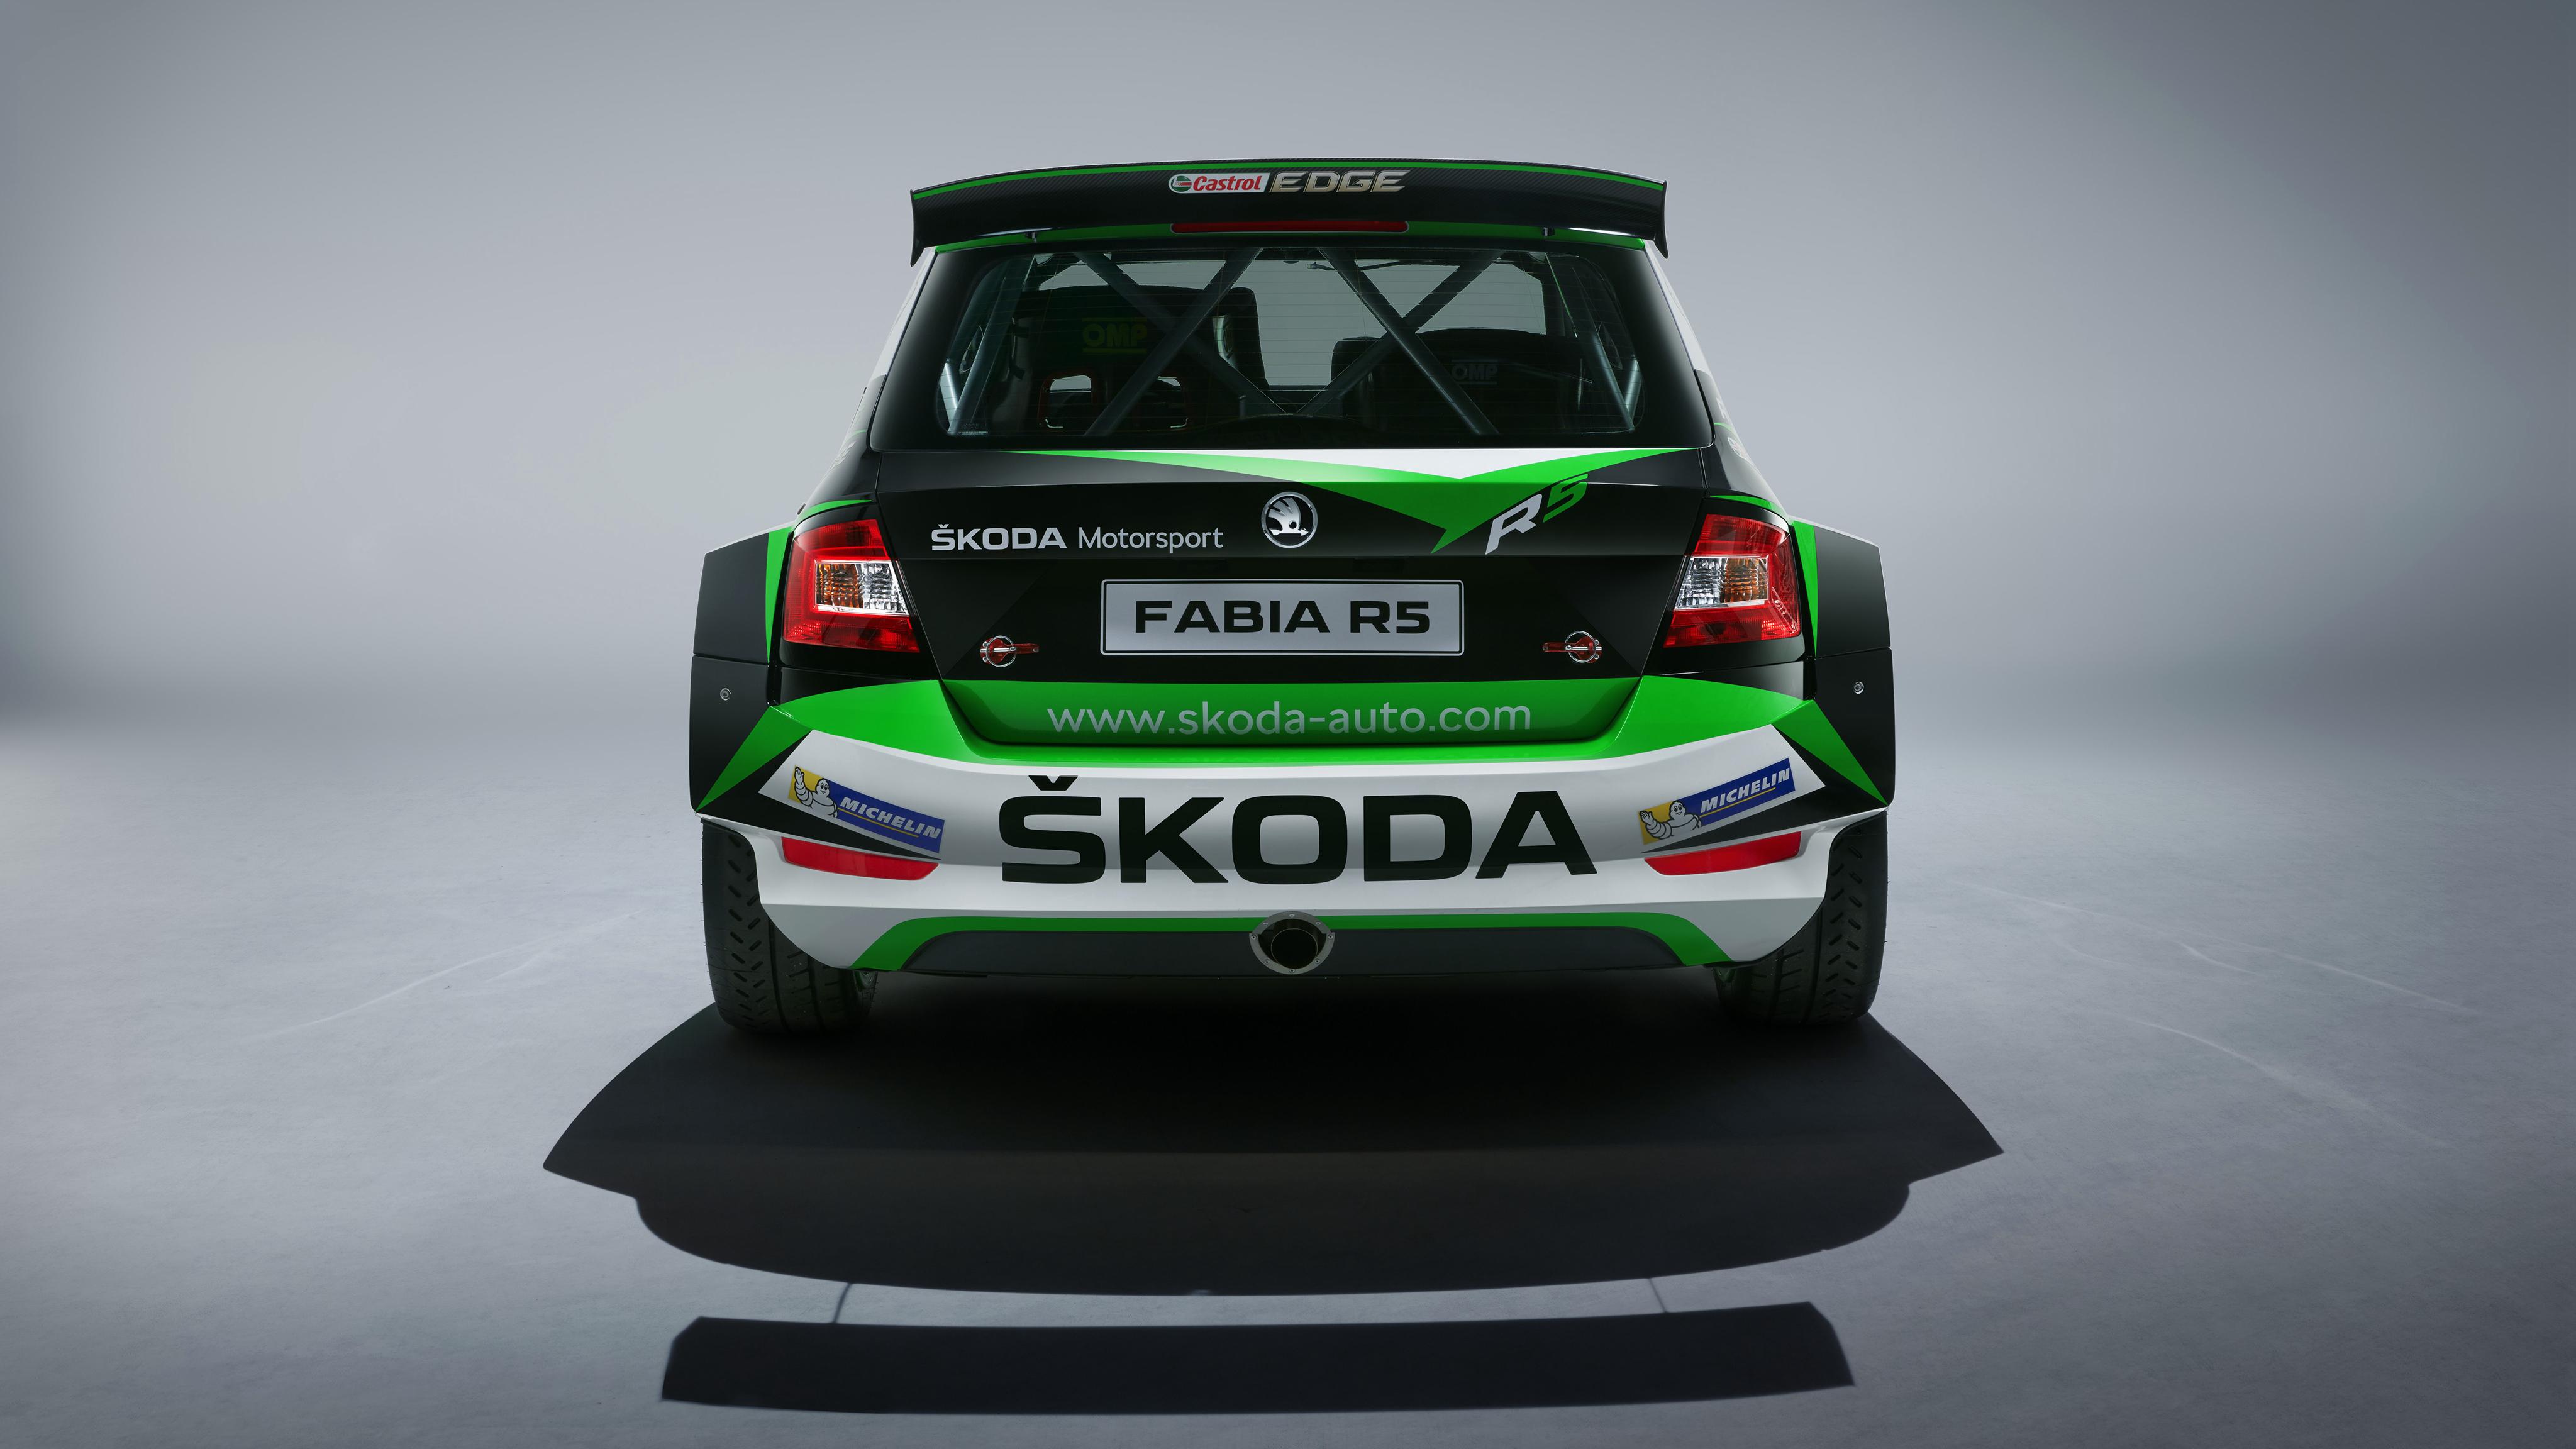 Skoda Fabia R5 Concept 4k 2019 2 Wallpaper Hd Car Wallpapers Id